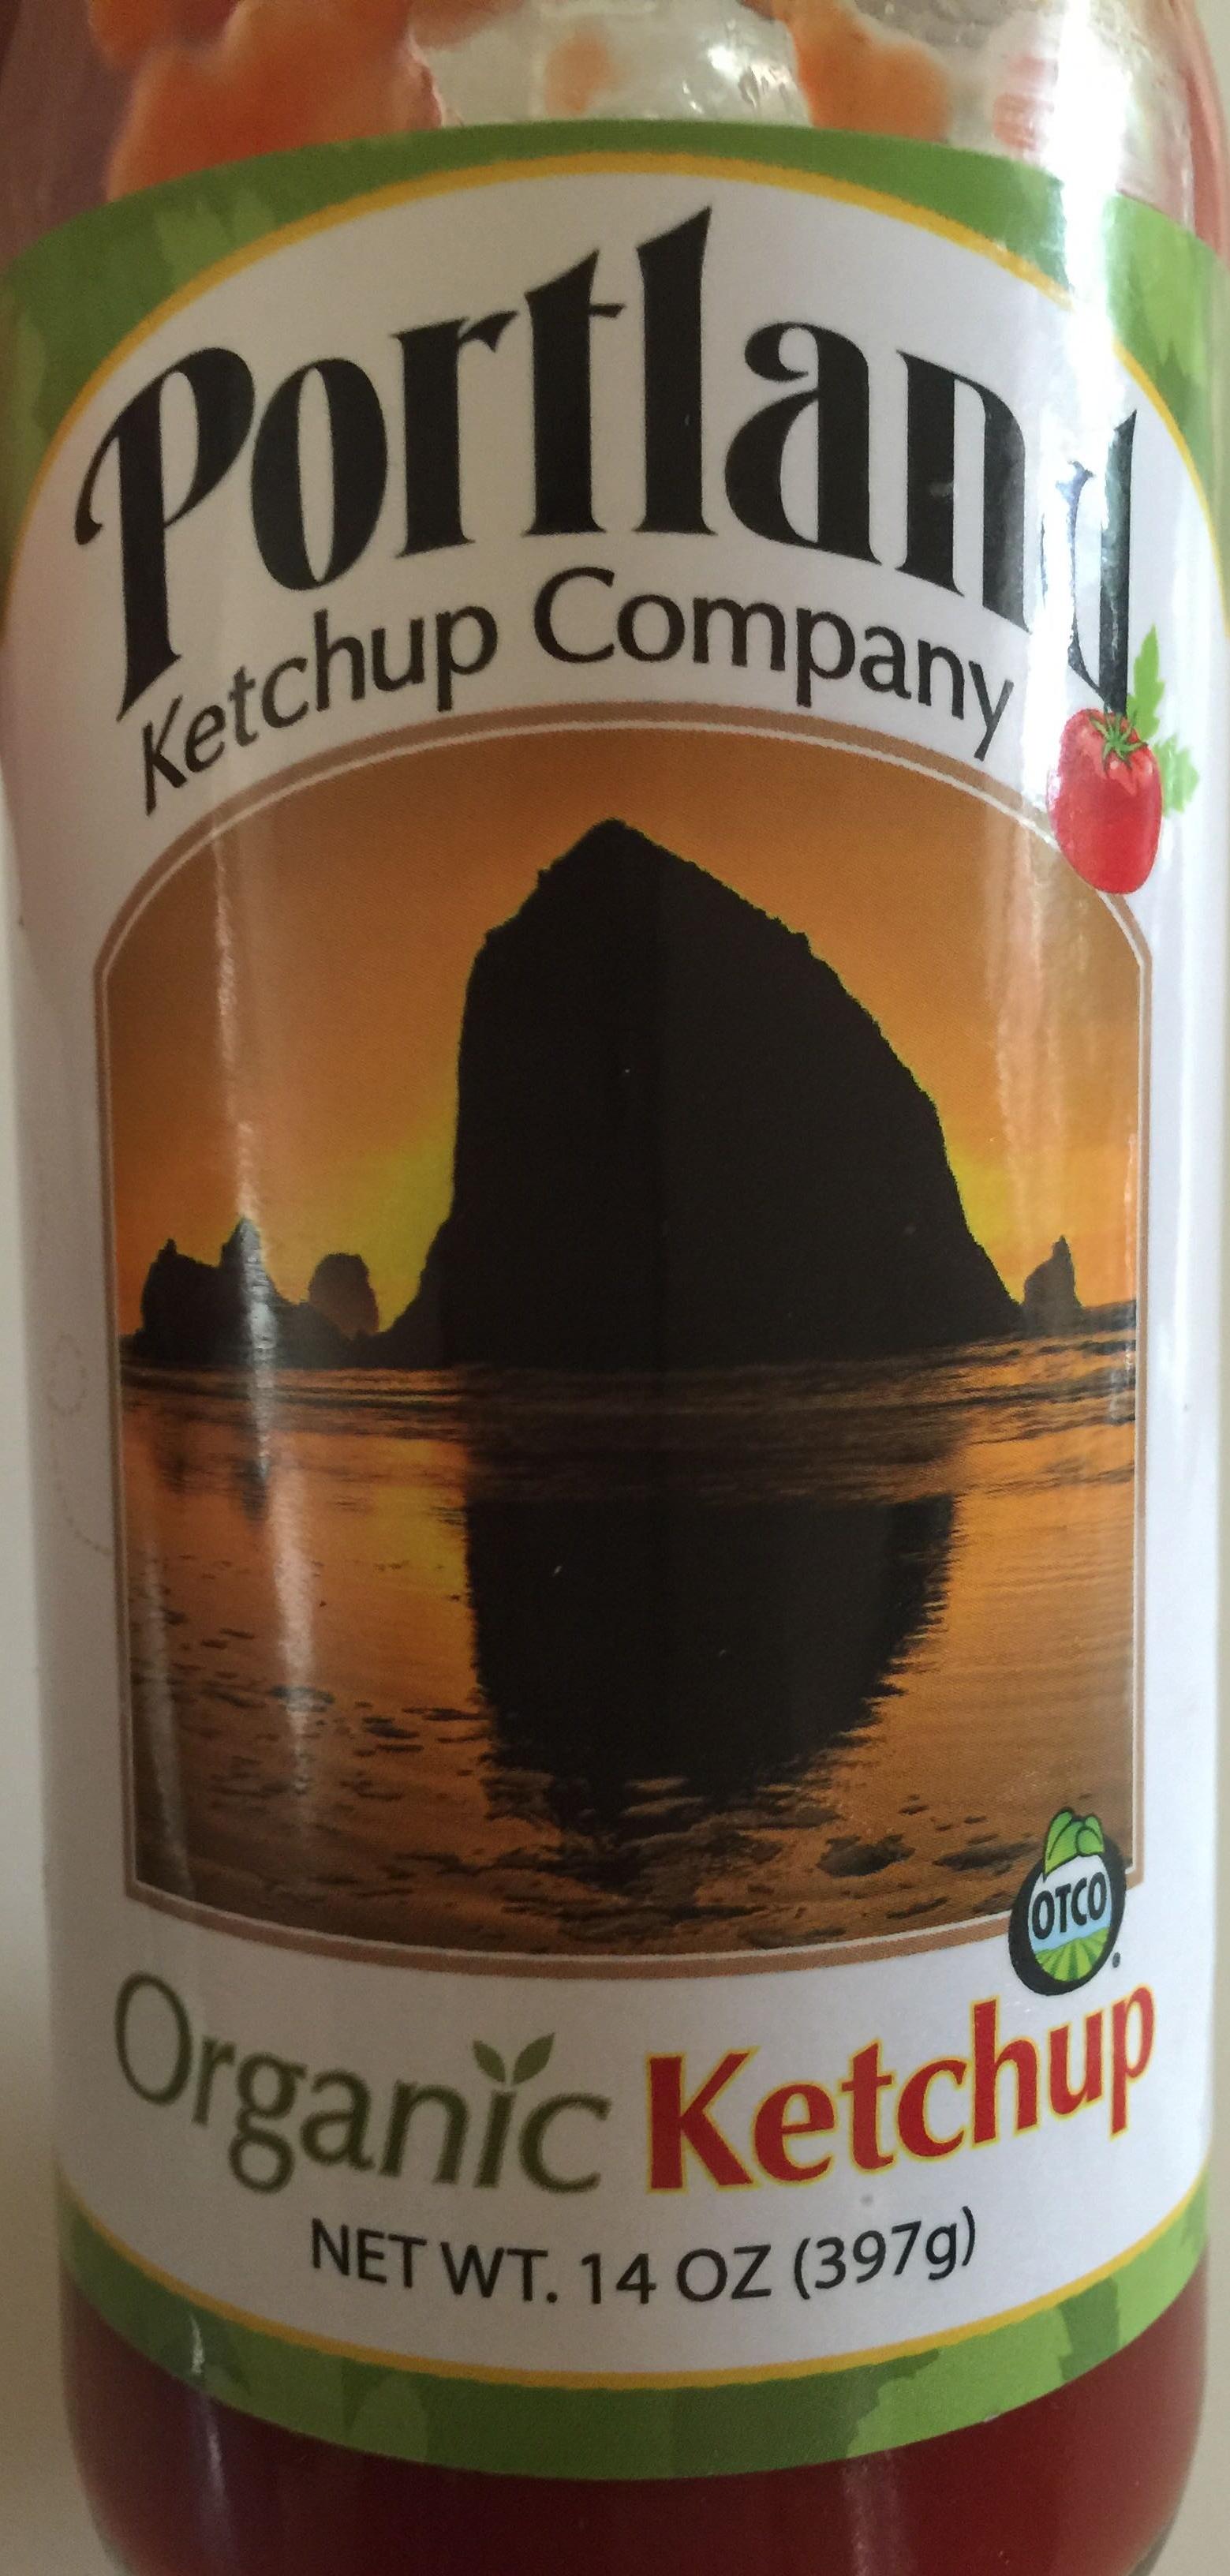 Portland Ketchup Company - Product